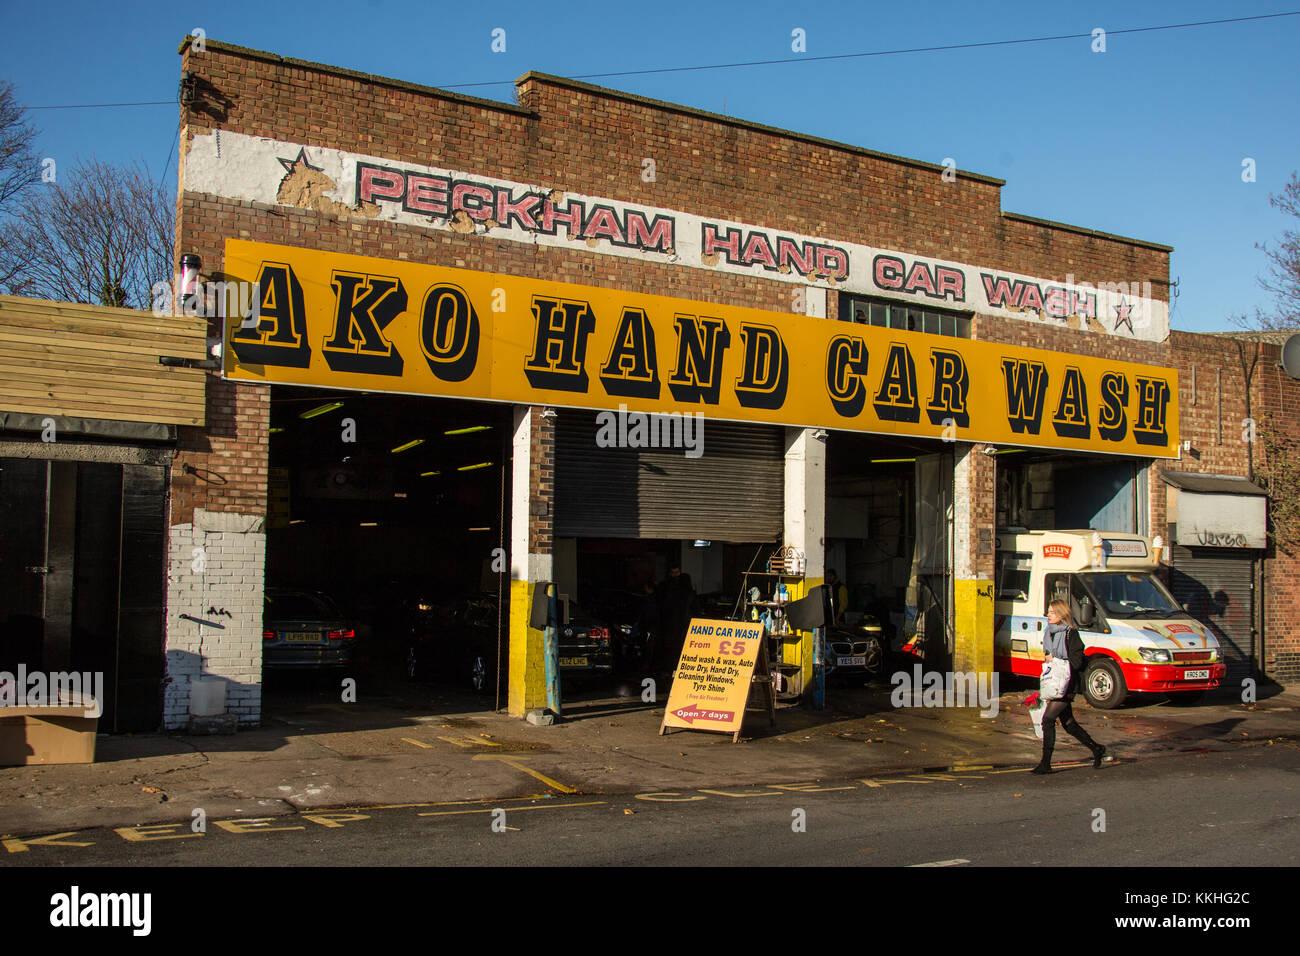 Hand Car Wash Uk Stock Photos Hand Car Wash Uk Stock Images Alamy